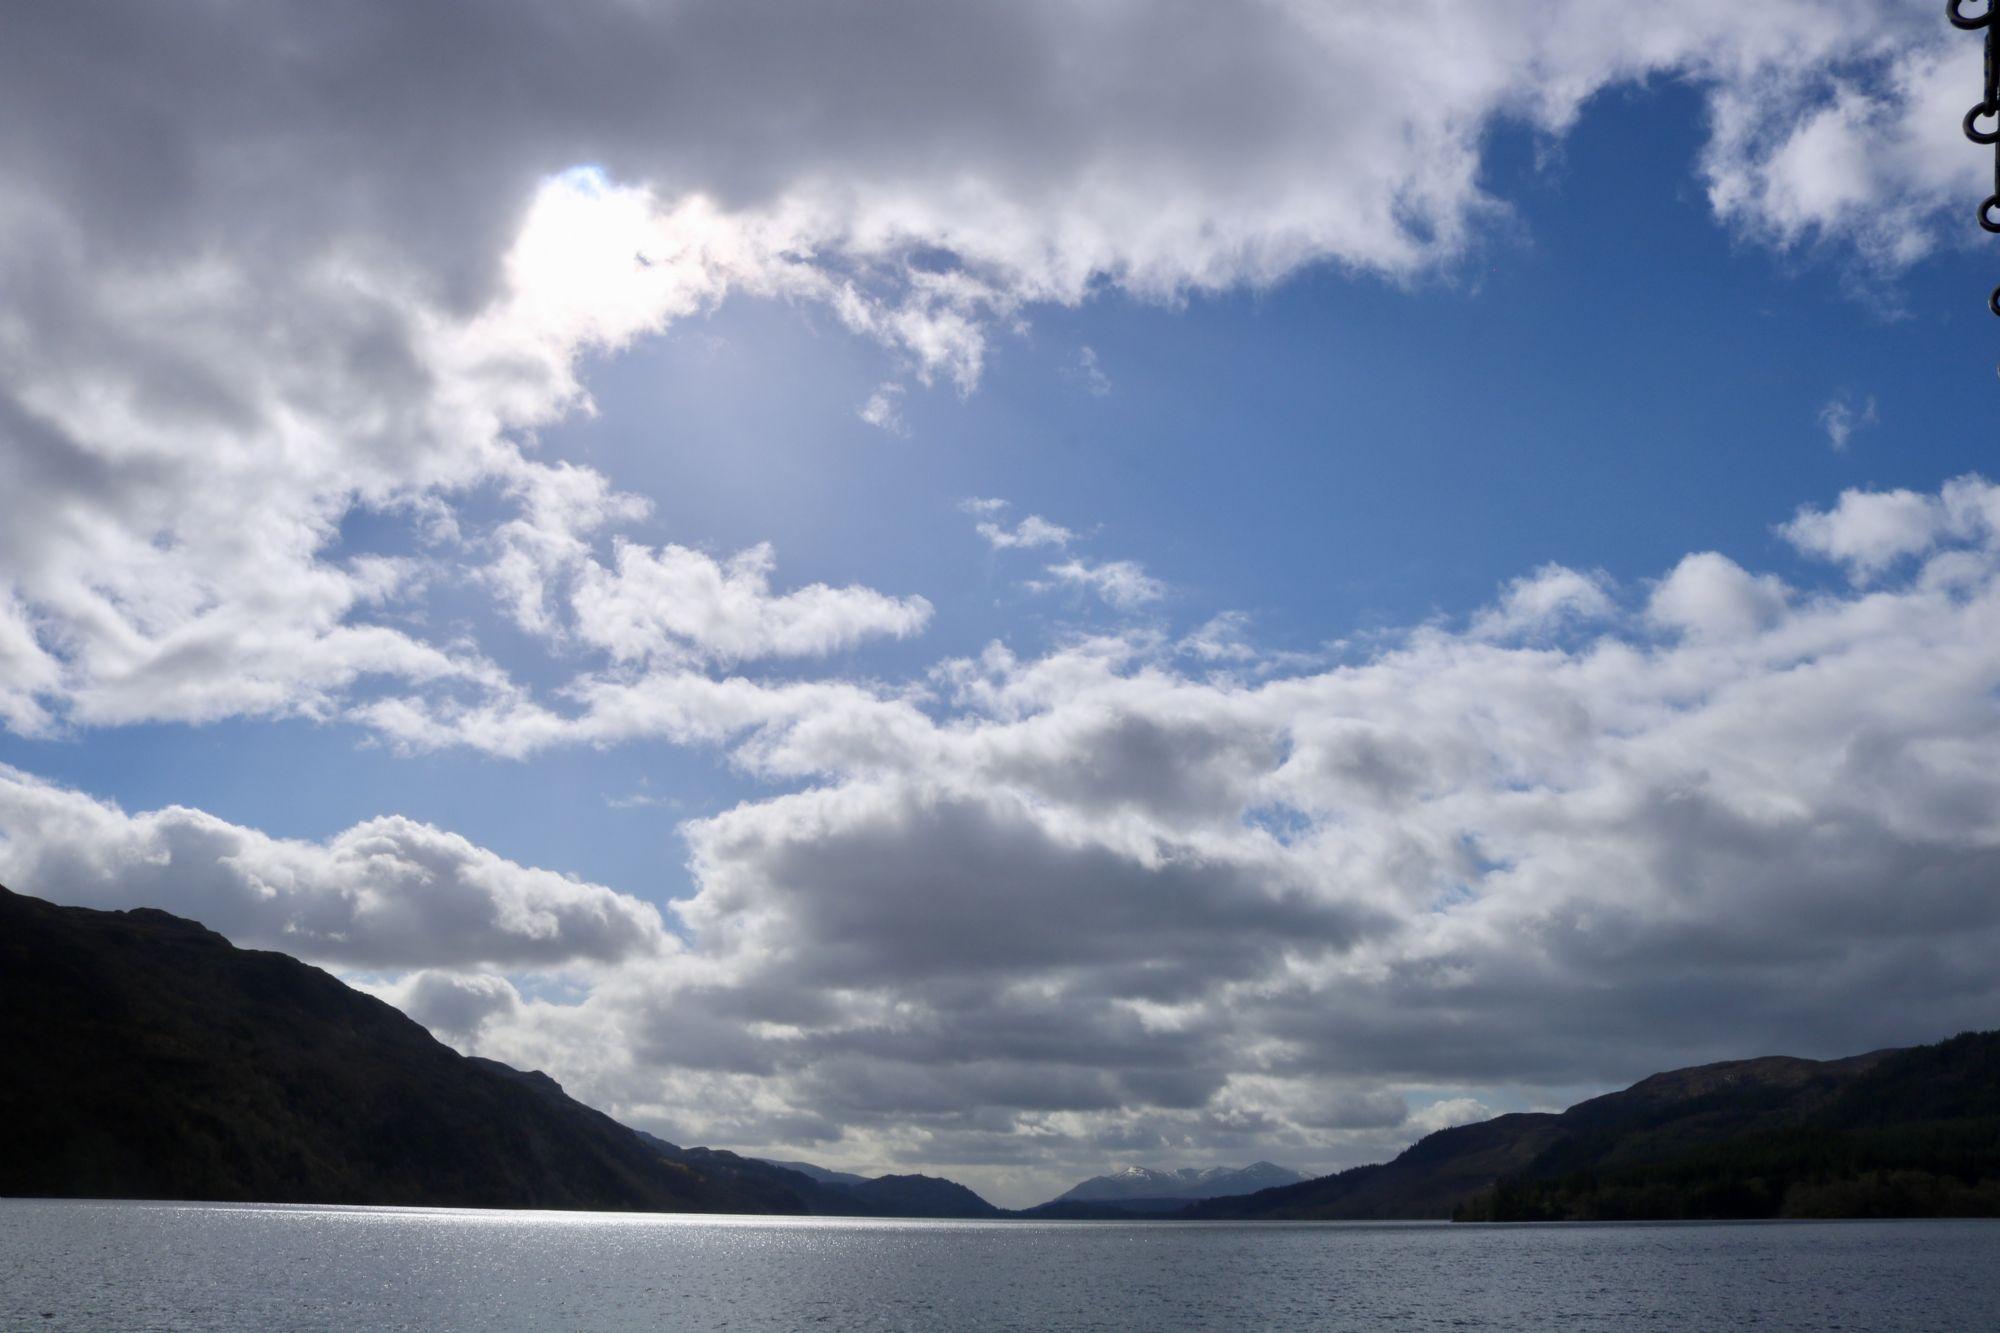 Loch Ness at 14:00